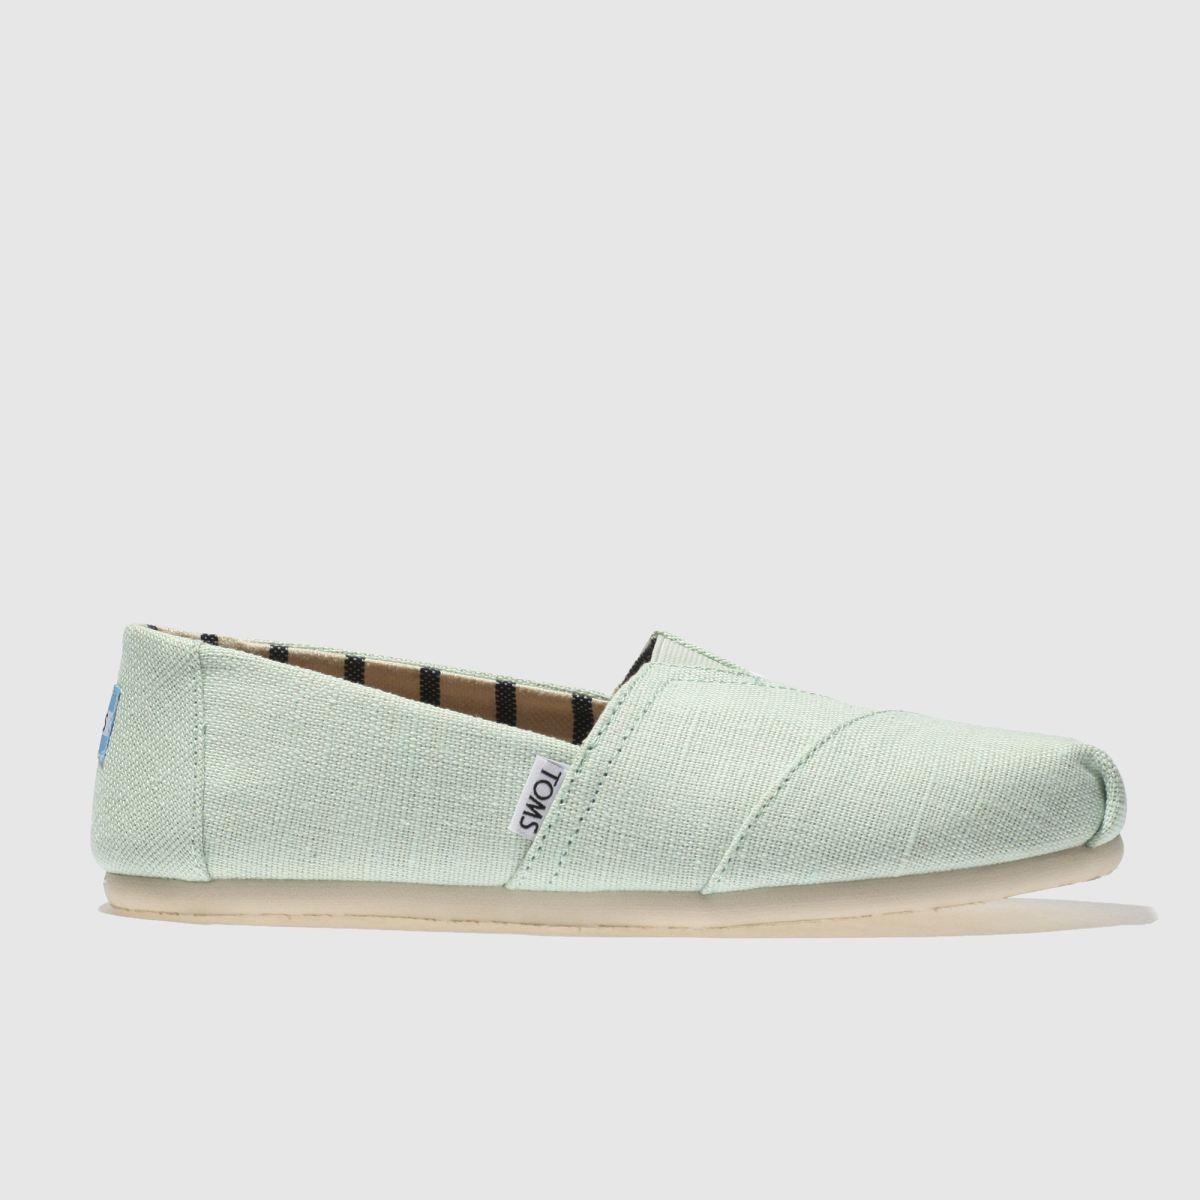 Toms Light Green Alpargata Venice Flat Shoes